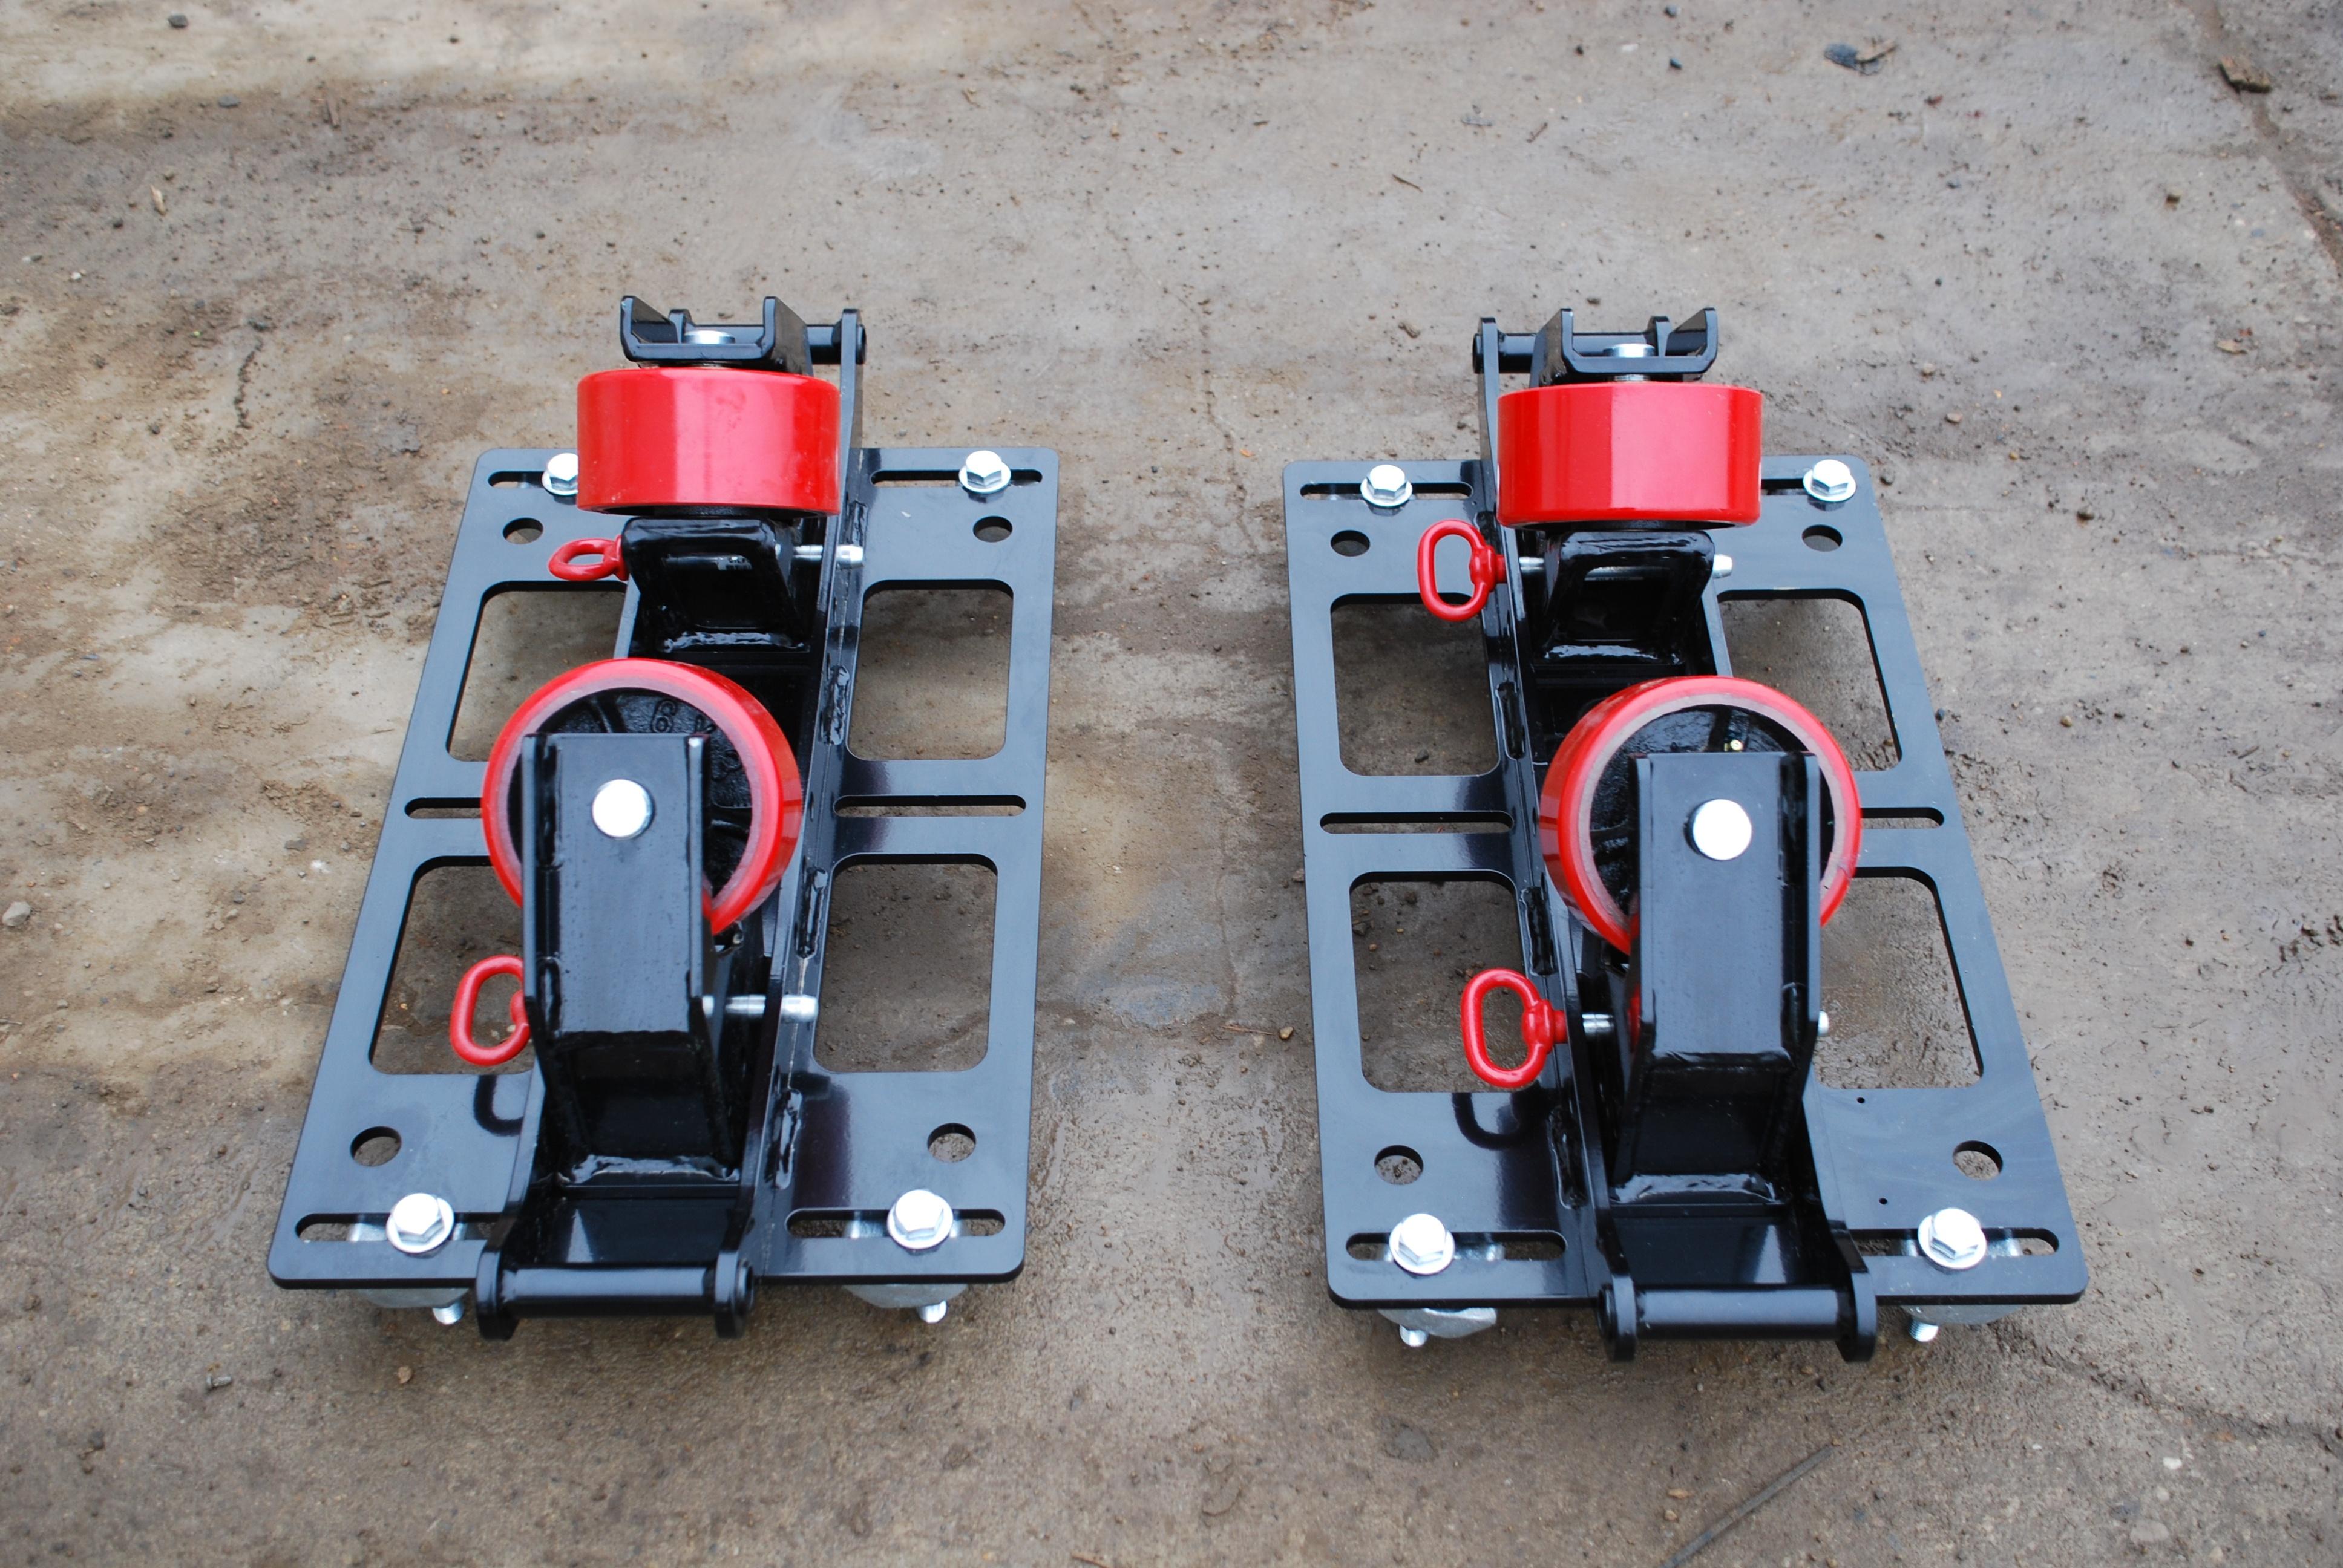 LJ welding 2-ton pipe rack beam clamp pipe rigging rollers rentals